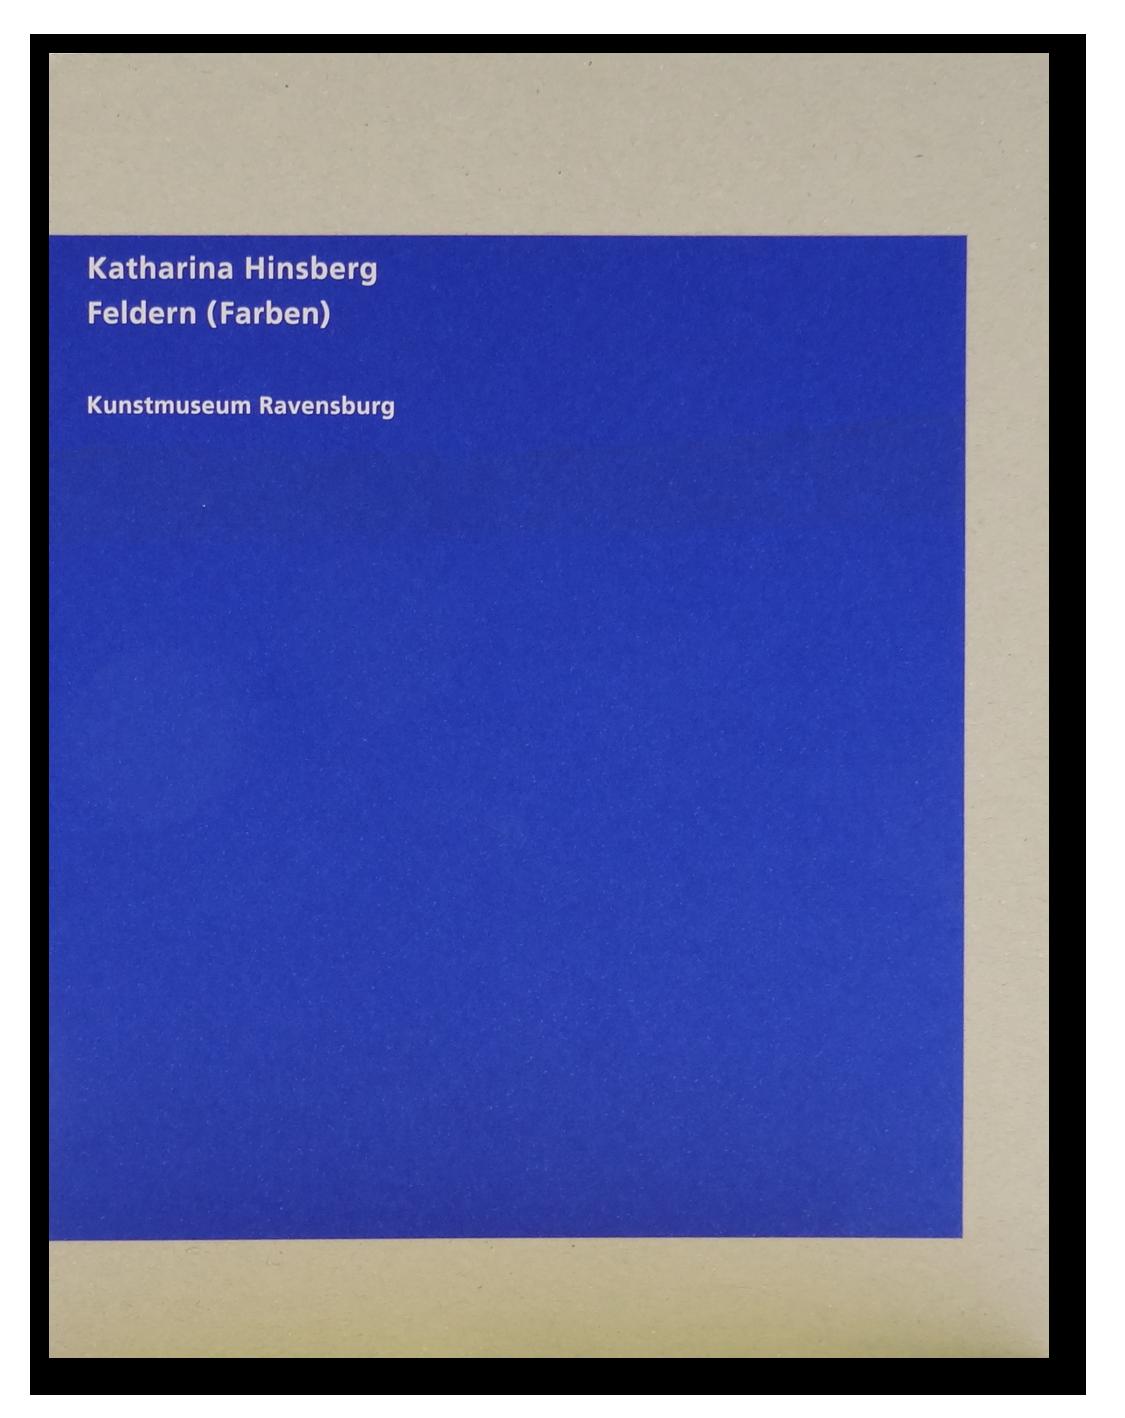 ausstellungskatalog katharina hinsberg feldern farben kunstmuseum ravensburg. Black Bedroom Furniture Sets. Home Design Ideas